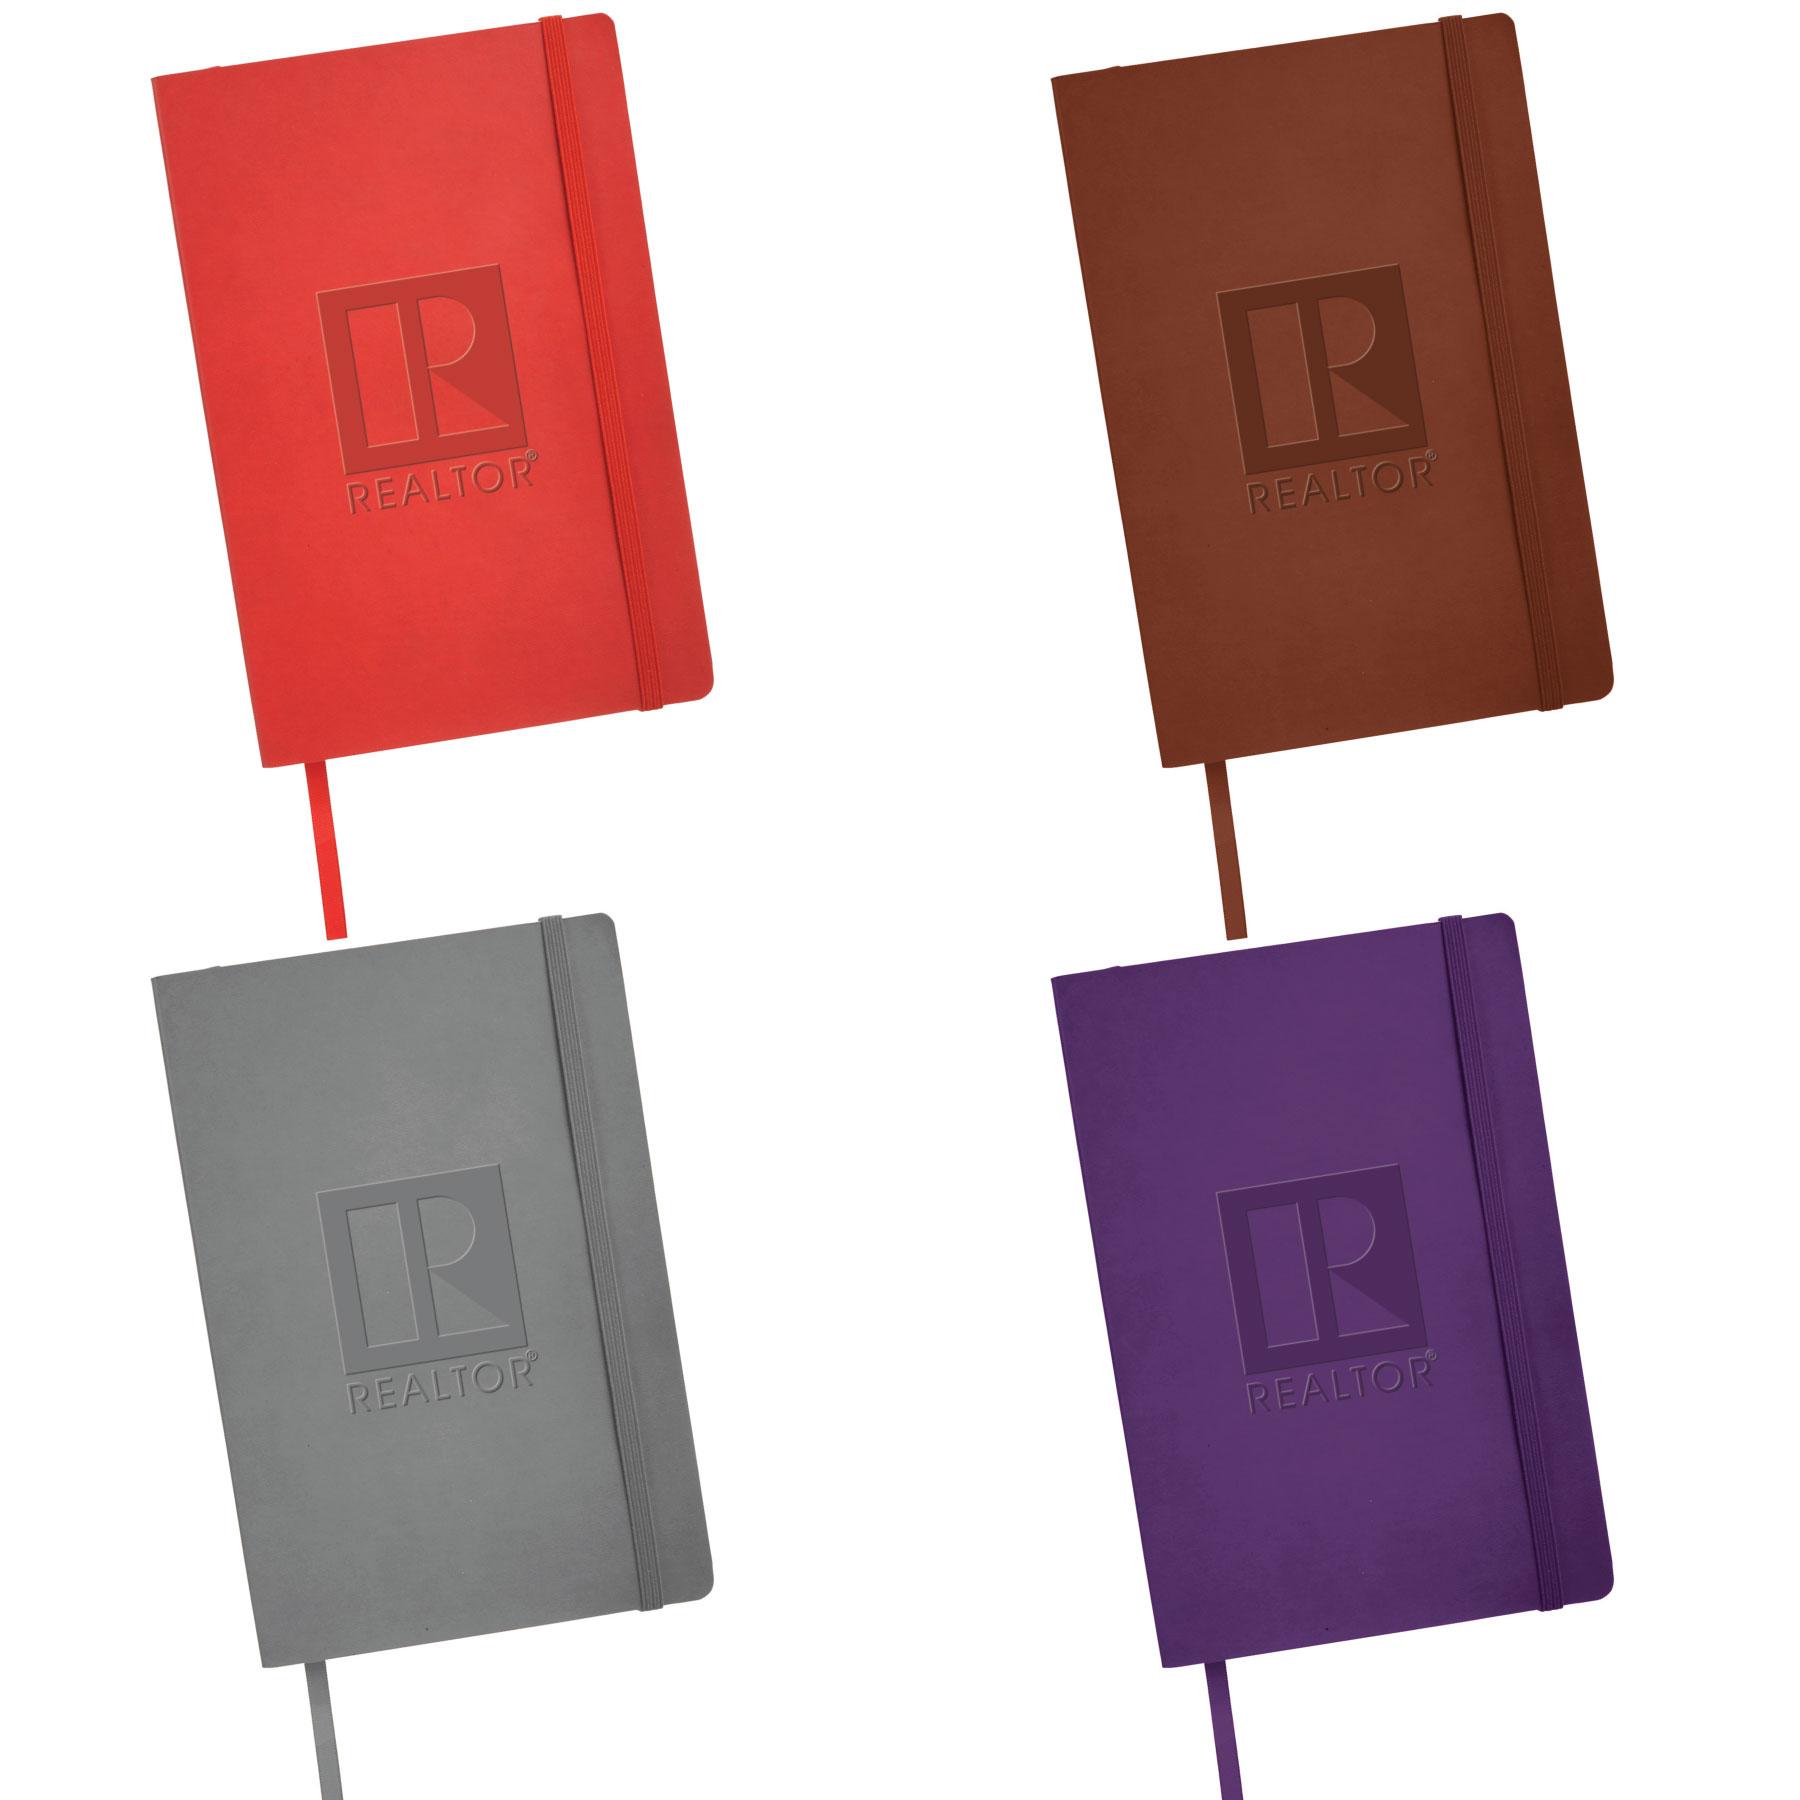 Soft Feel Desk Journal Journals,Books,Folders,Padfolios,Moleskins,Binders,Desks,Organizers